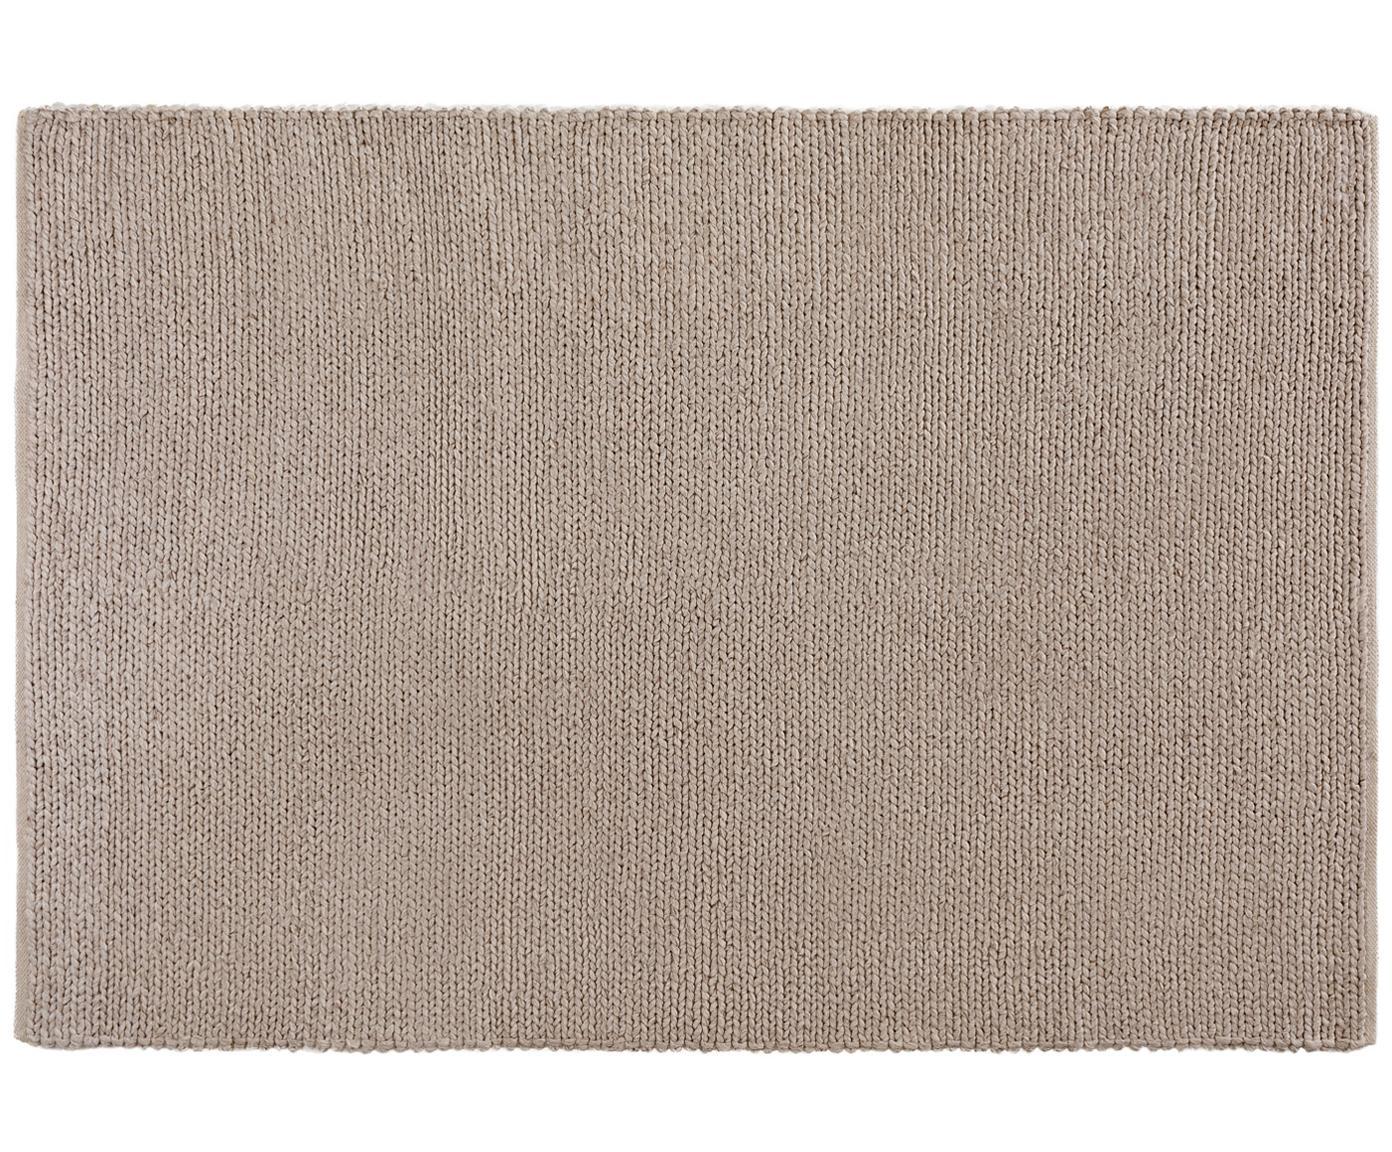 Alfombra artesanal de lana Uno, Parte superior: 60%lana, 40%poliéster, Reverso: algodón, Gris, An 120 x L 170 cm (Tamaño S)